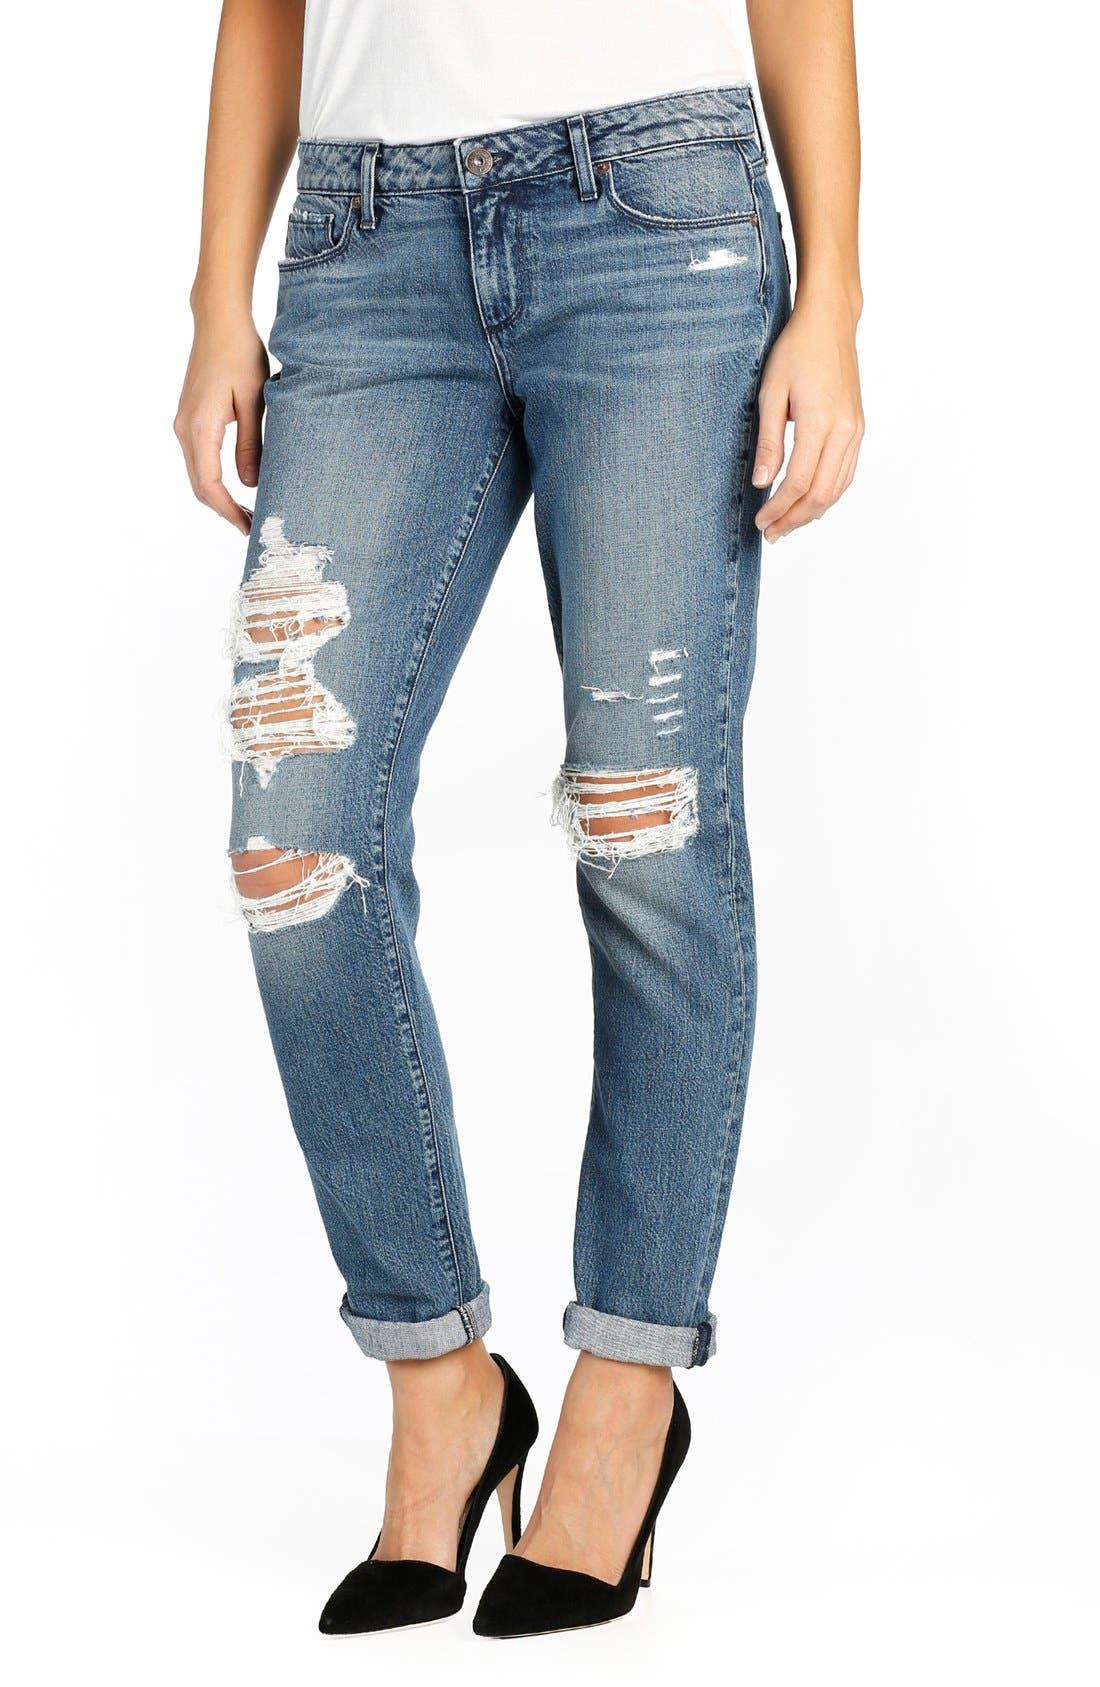 Alternate Image 1 Selected - PAIGE 'Jimmy Jimmy' Destroyed Skinny Jeans (Westley Destructed)